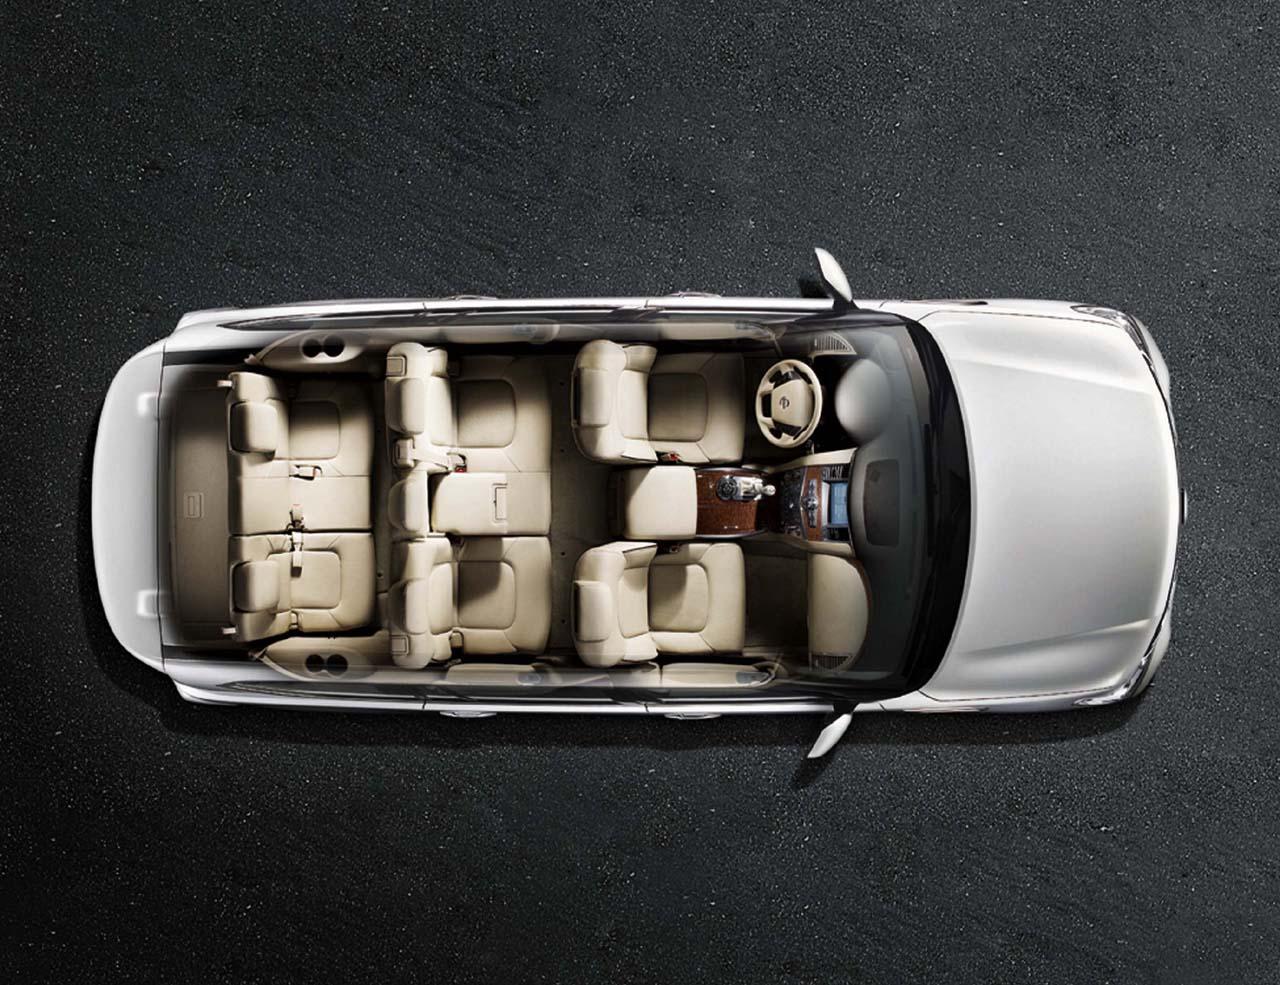 2010 Nissan Patrol Unveiled Autoevolution